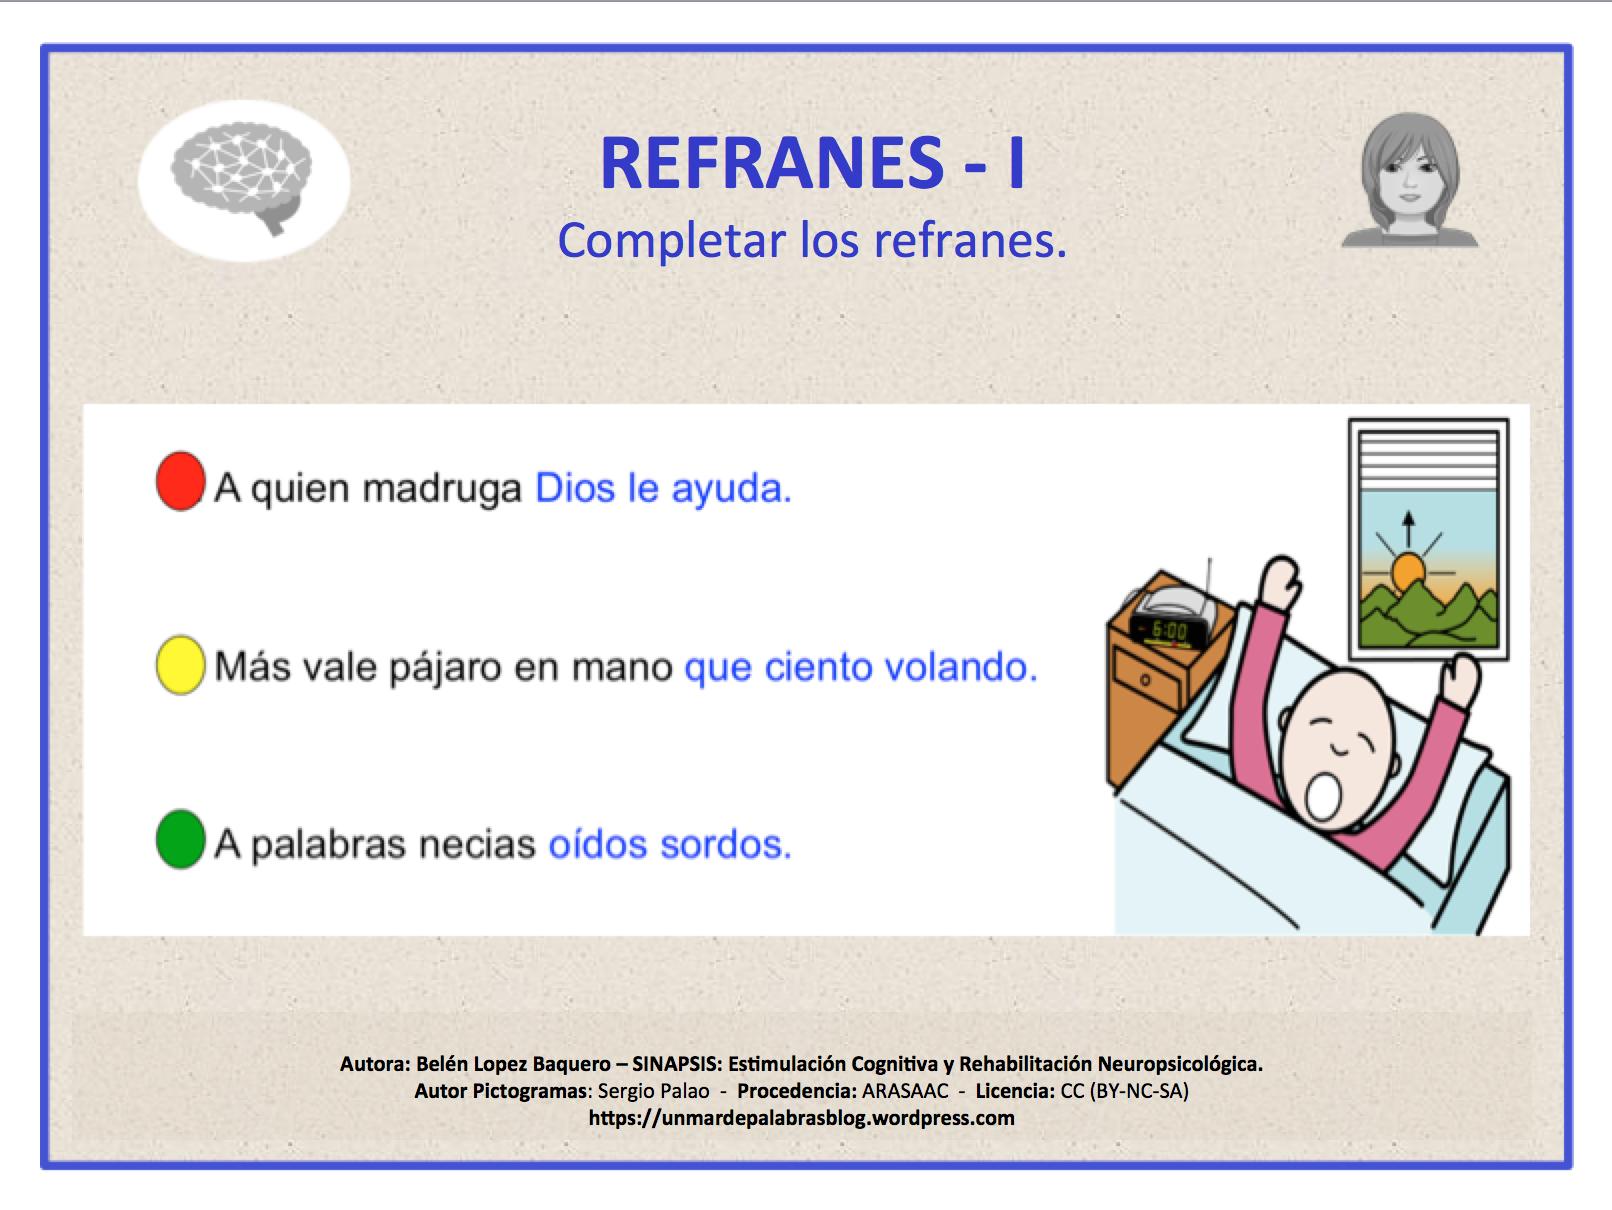 Refranes-I_completar